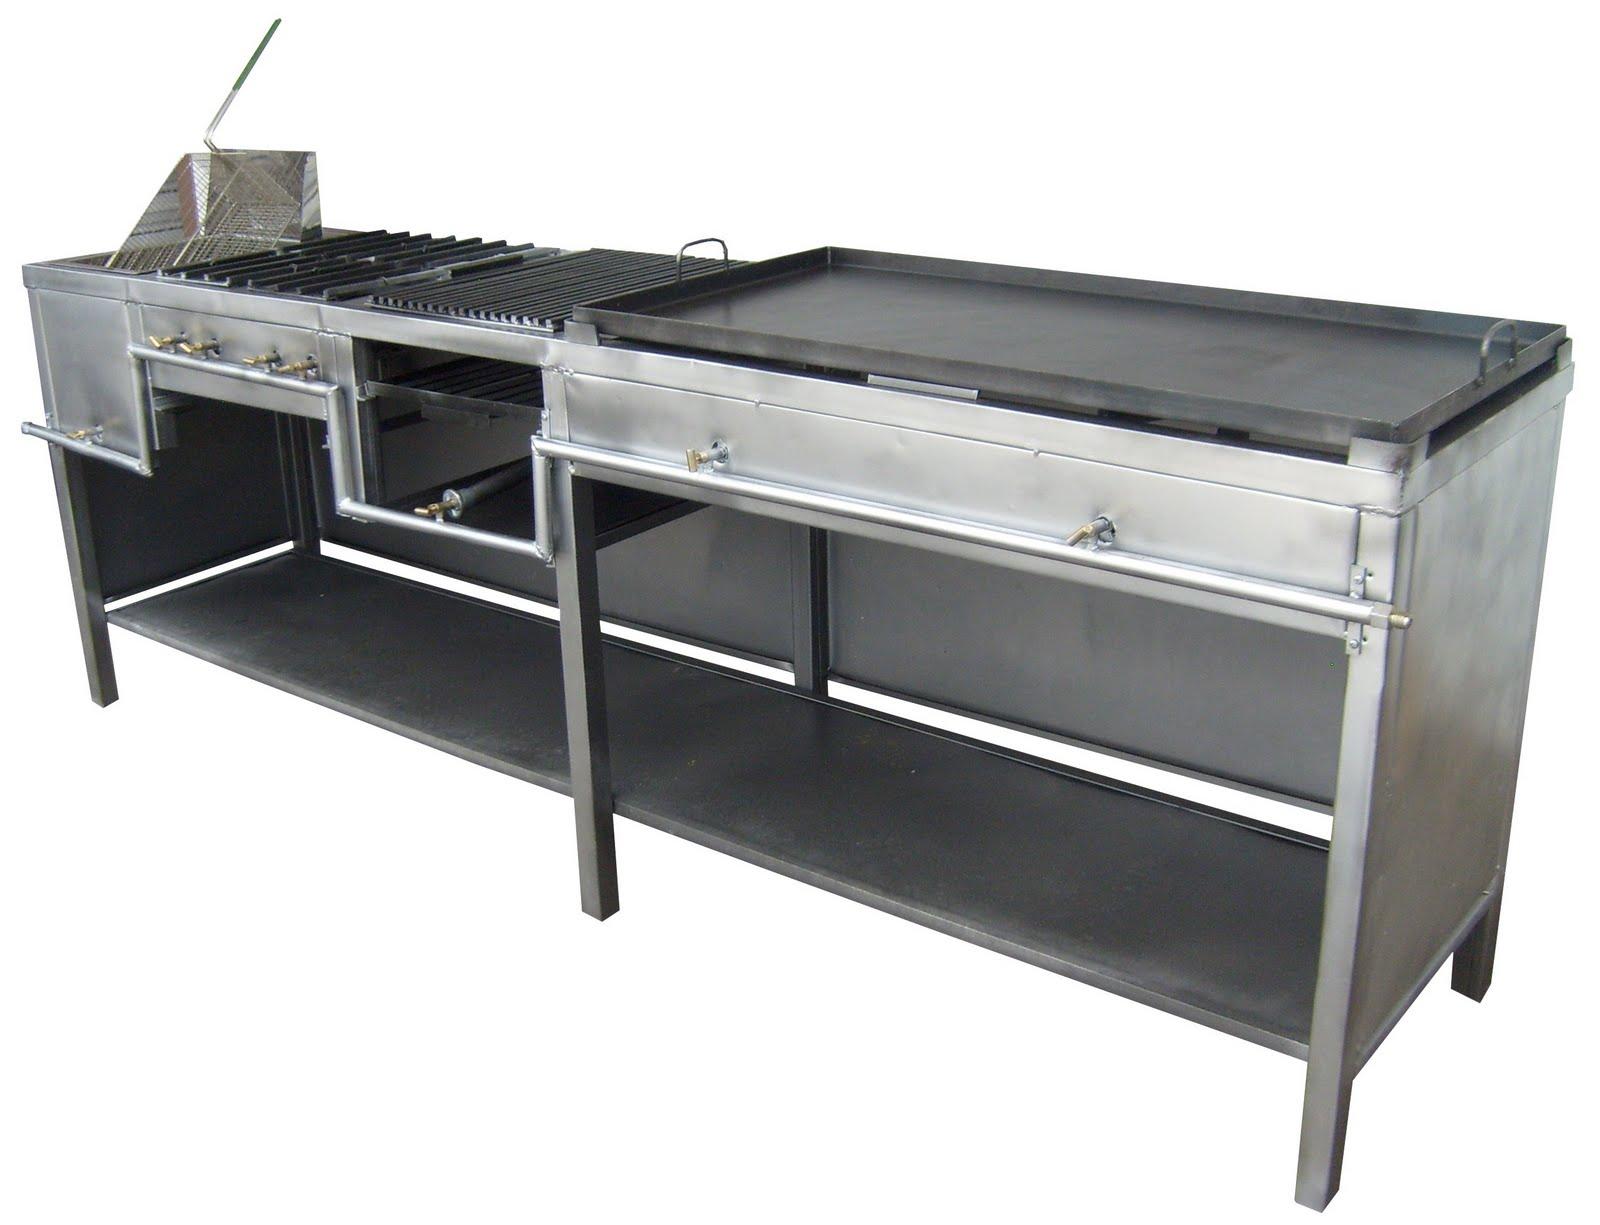 Freidora estufa con 4 hornillas asador y plancha 4 en 1 - Planchas para cocinar a gas ...